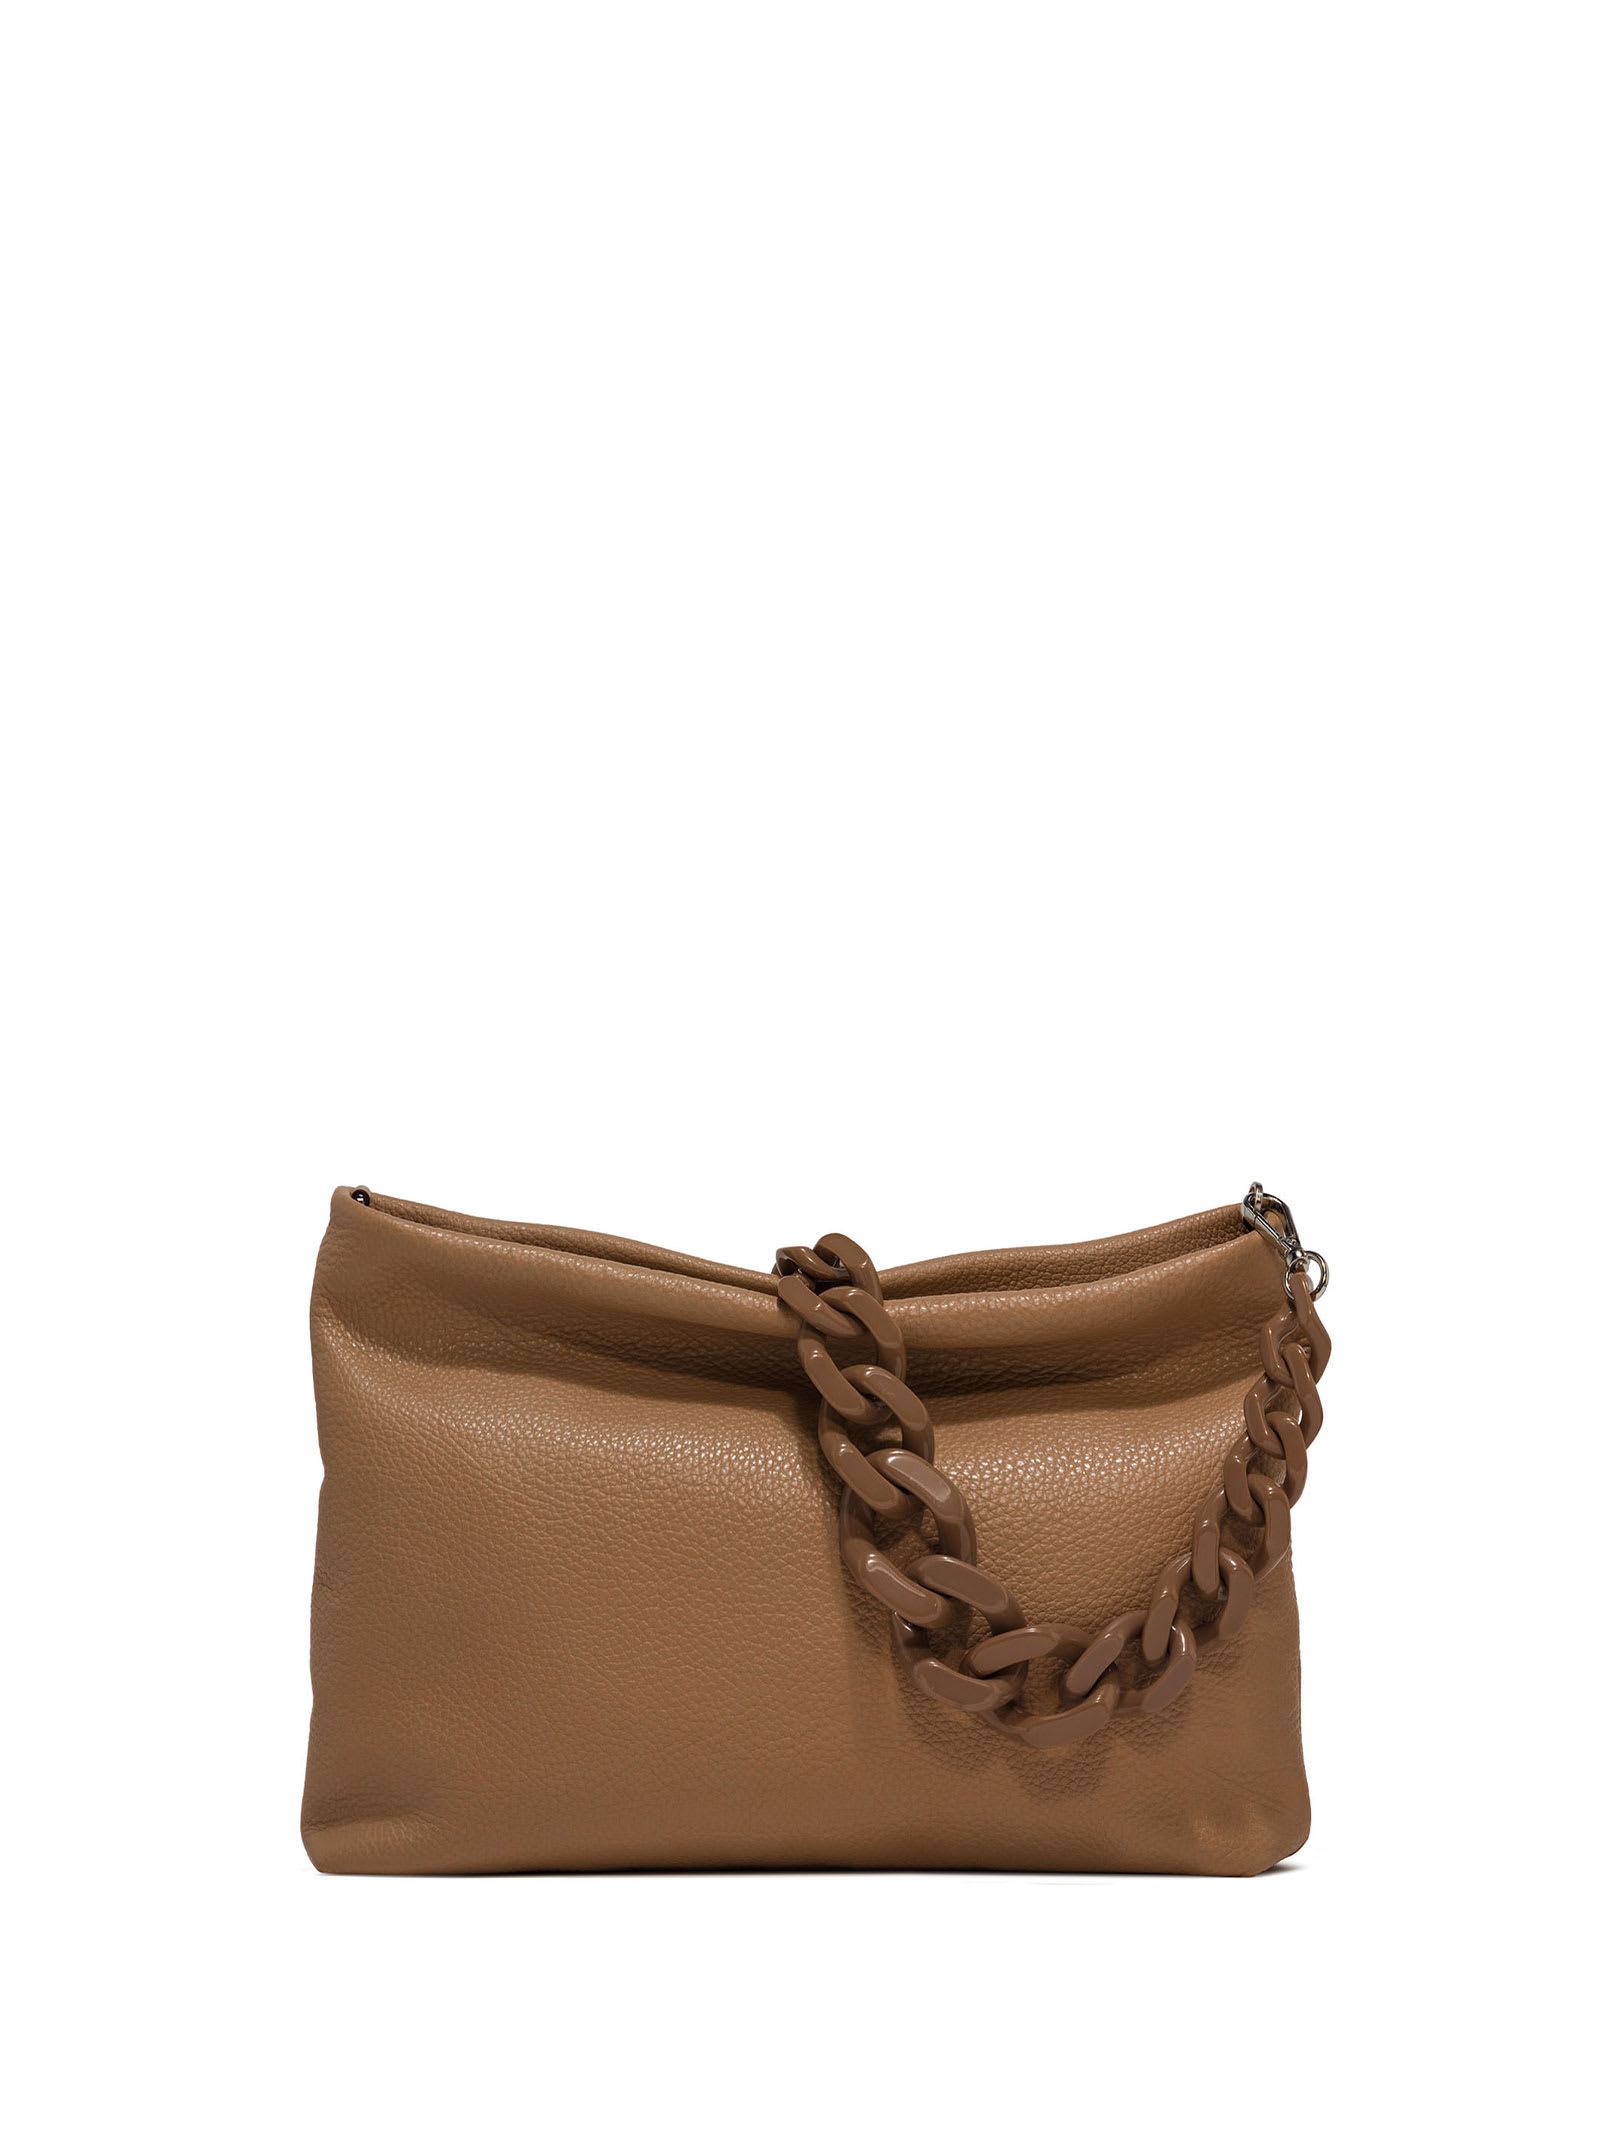 Camel Clutch Bag